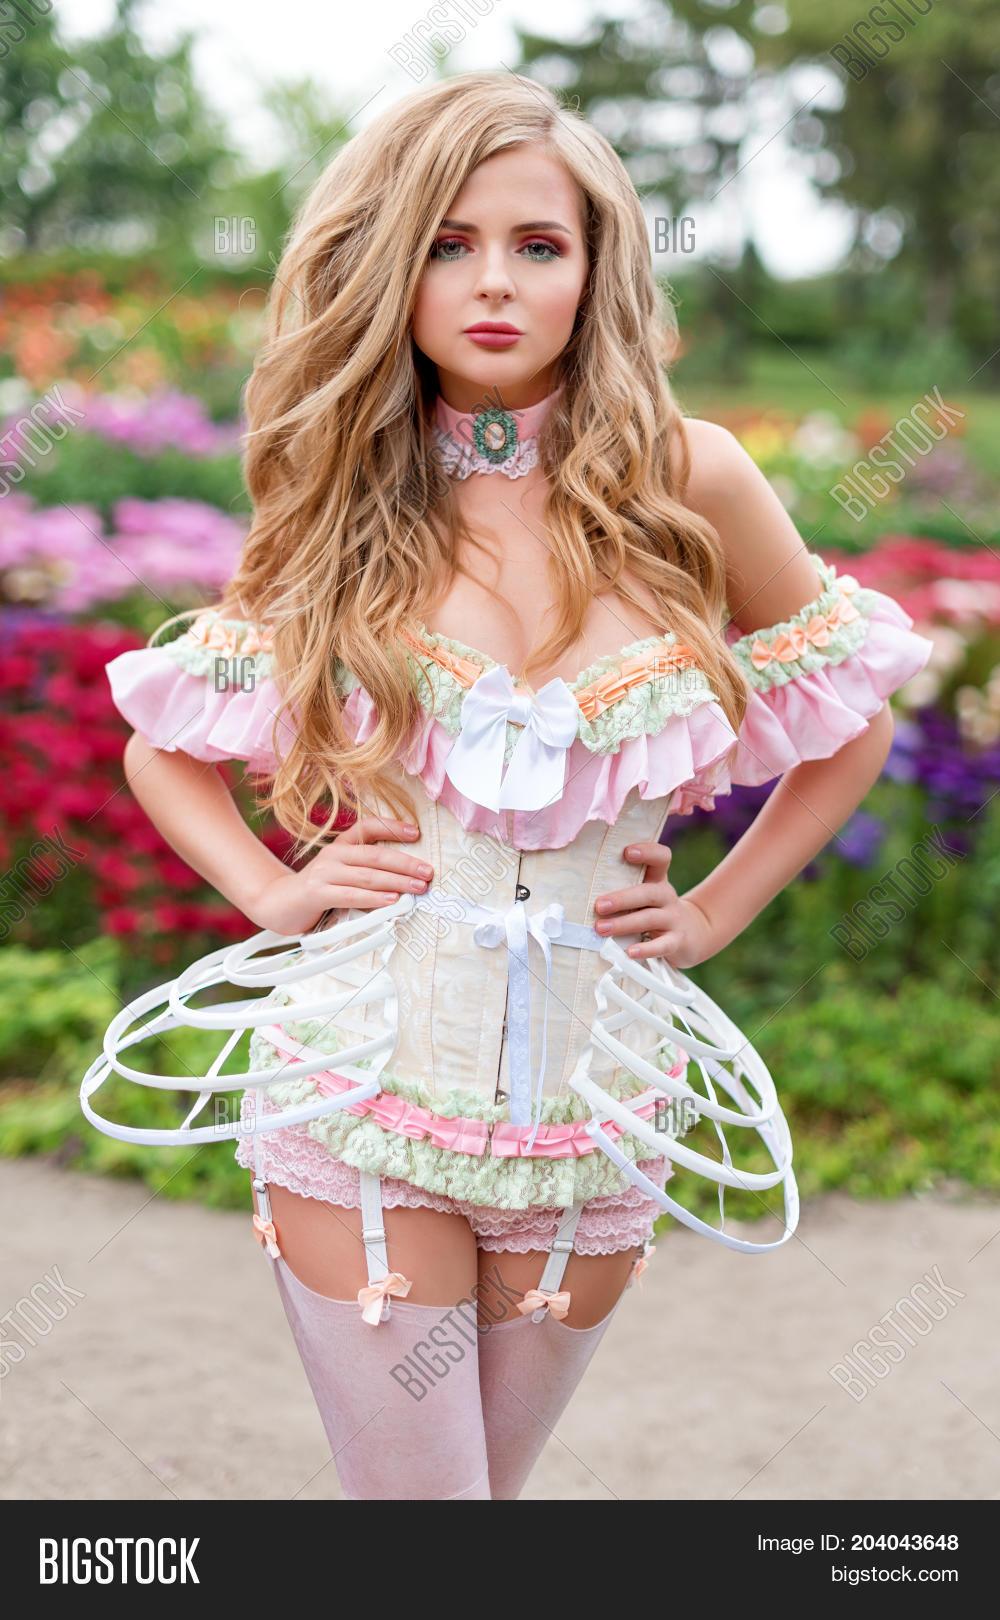 Sexy Blonde Woman Image  Photo Free Trial  Bigstock-7433